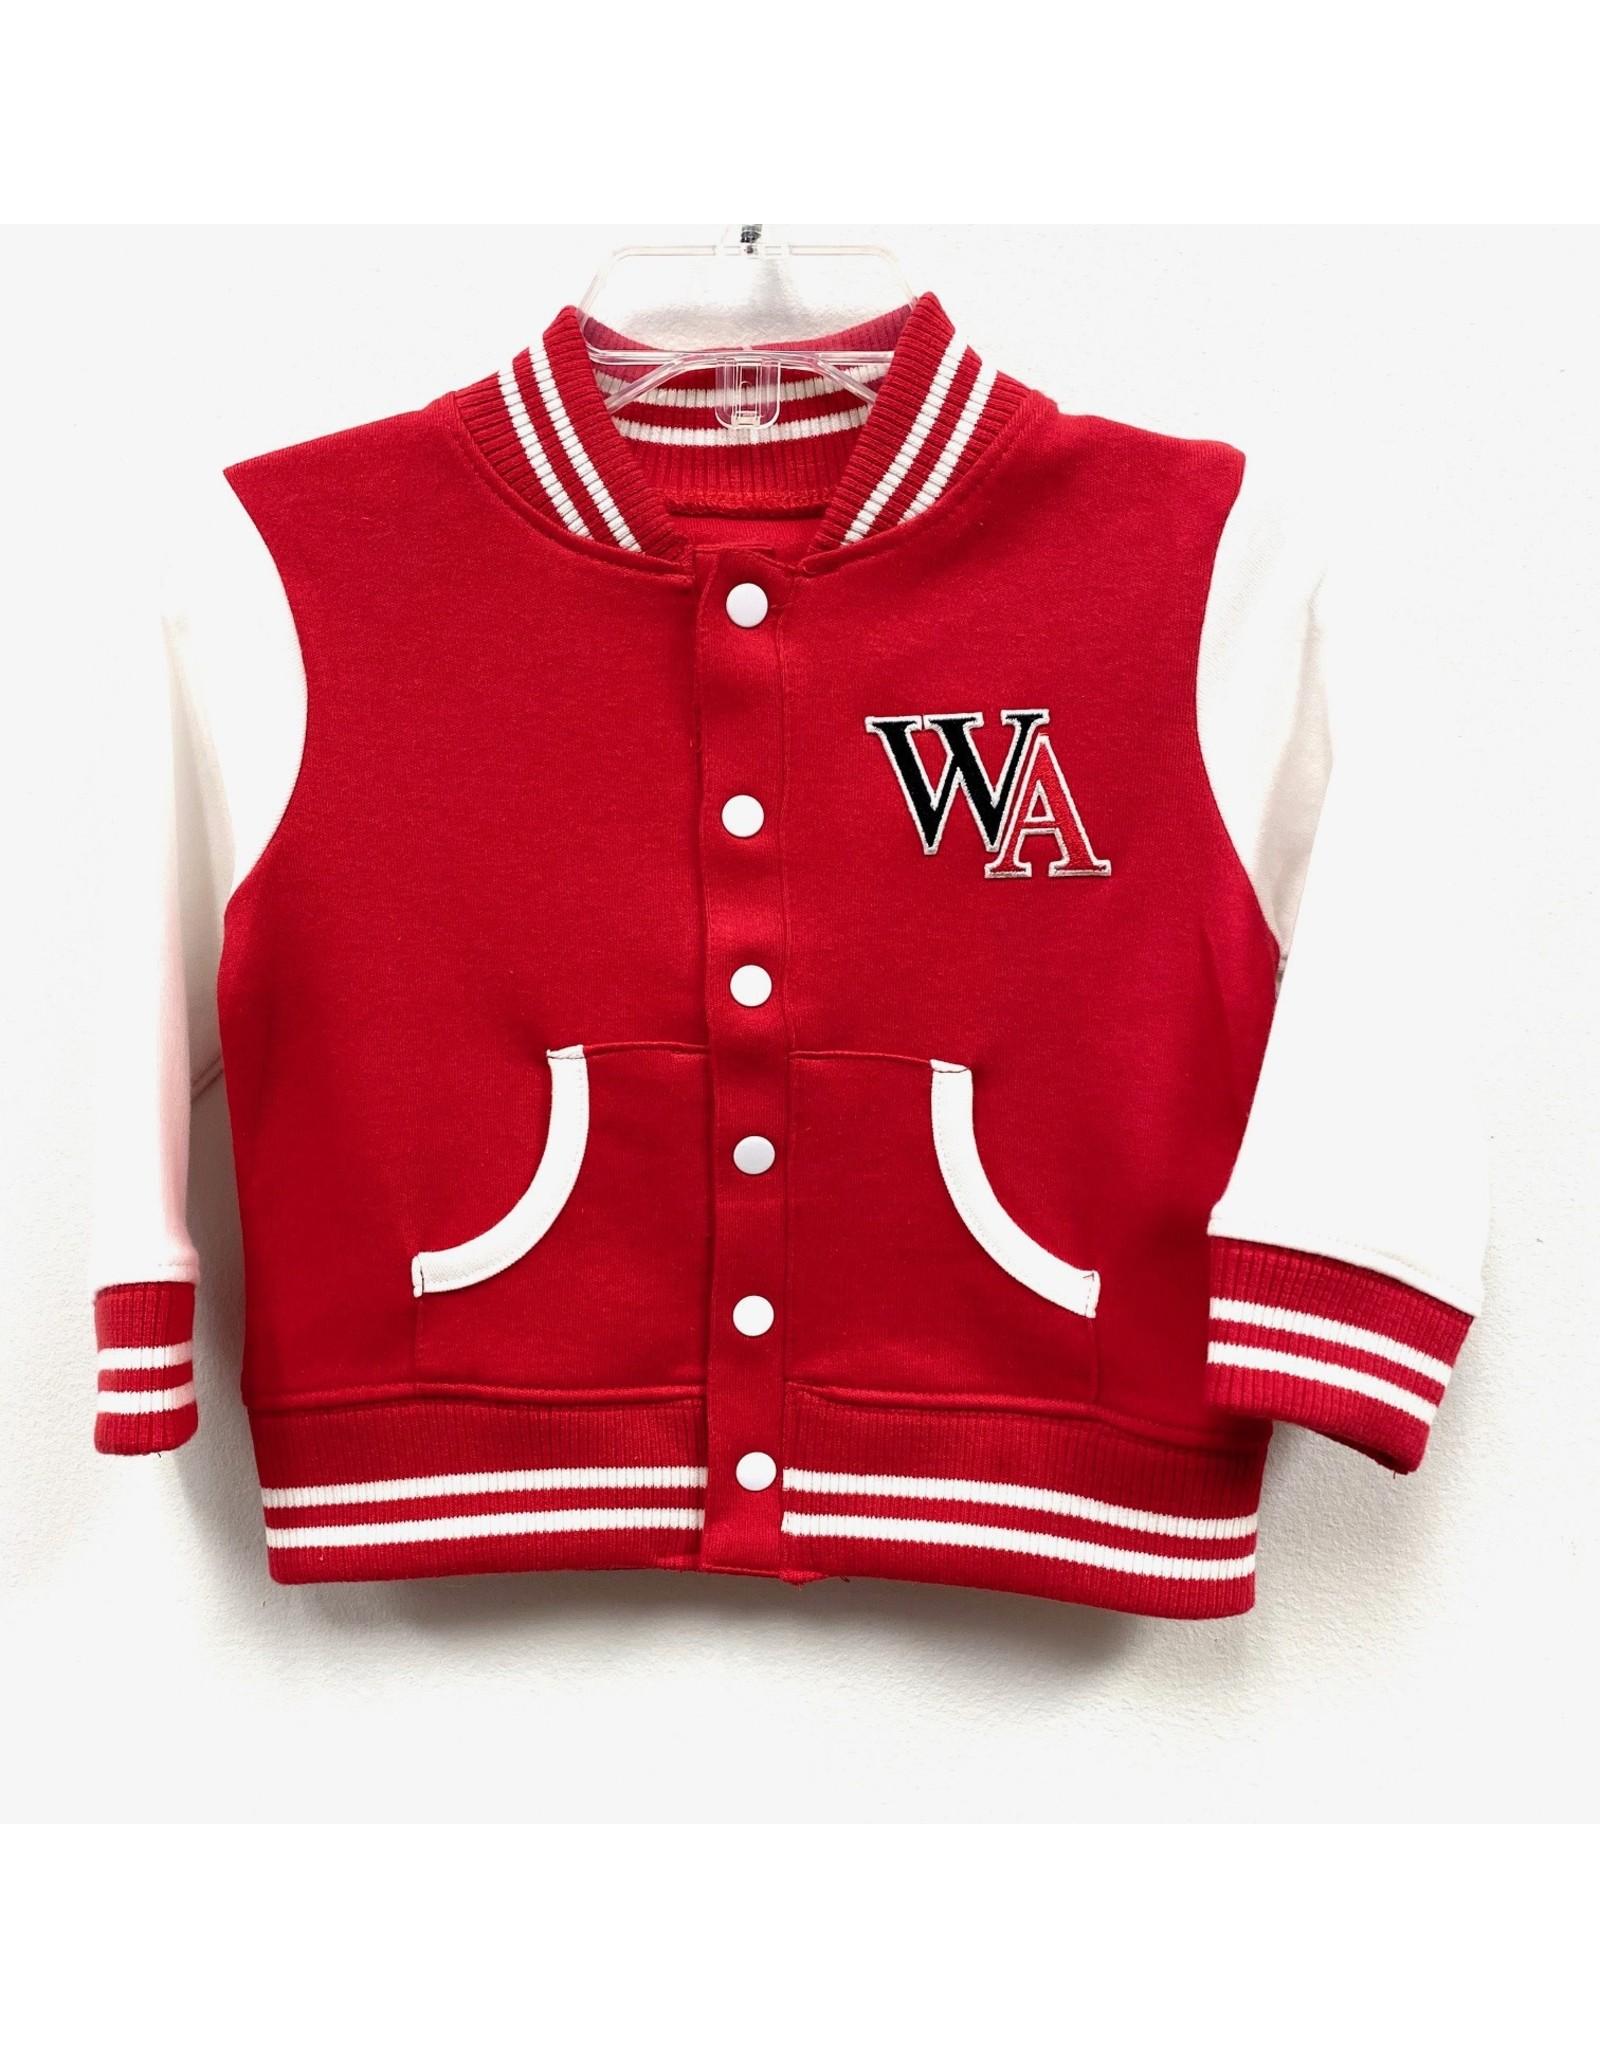 Creative Knitwear Baby Varsity Jacket by Creative Knitwear